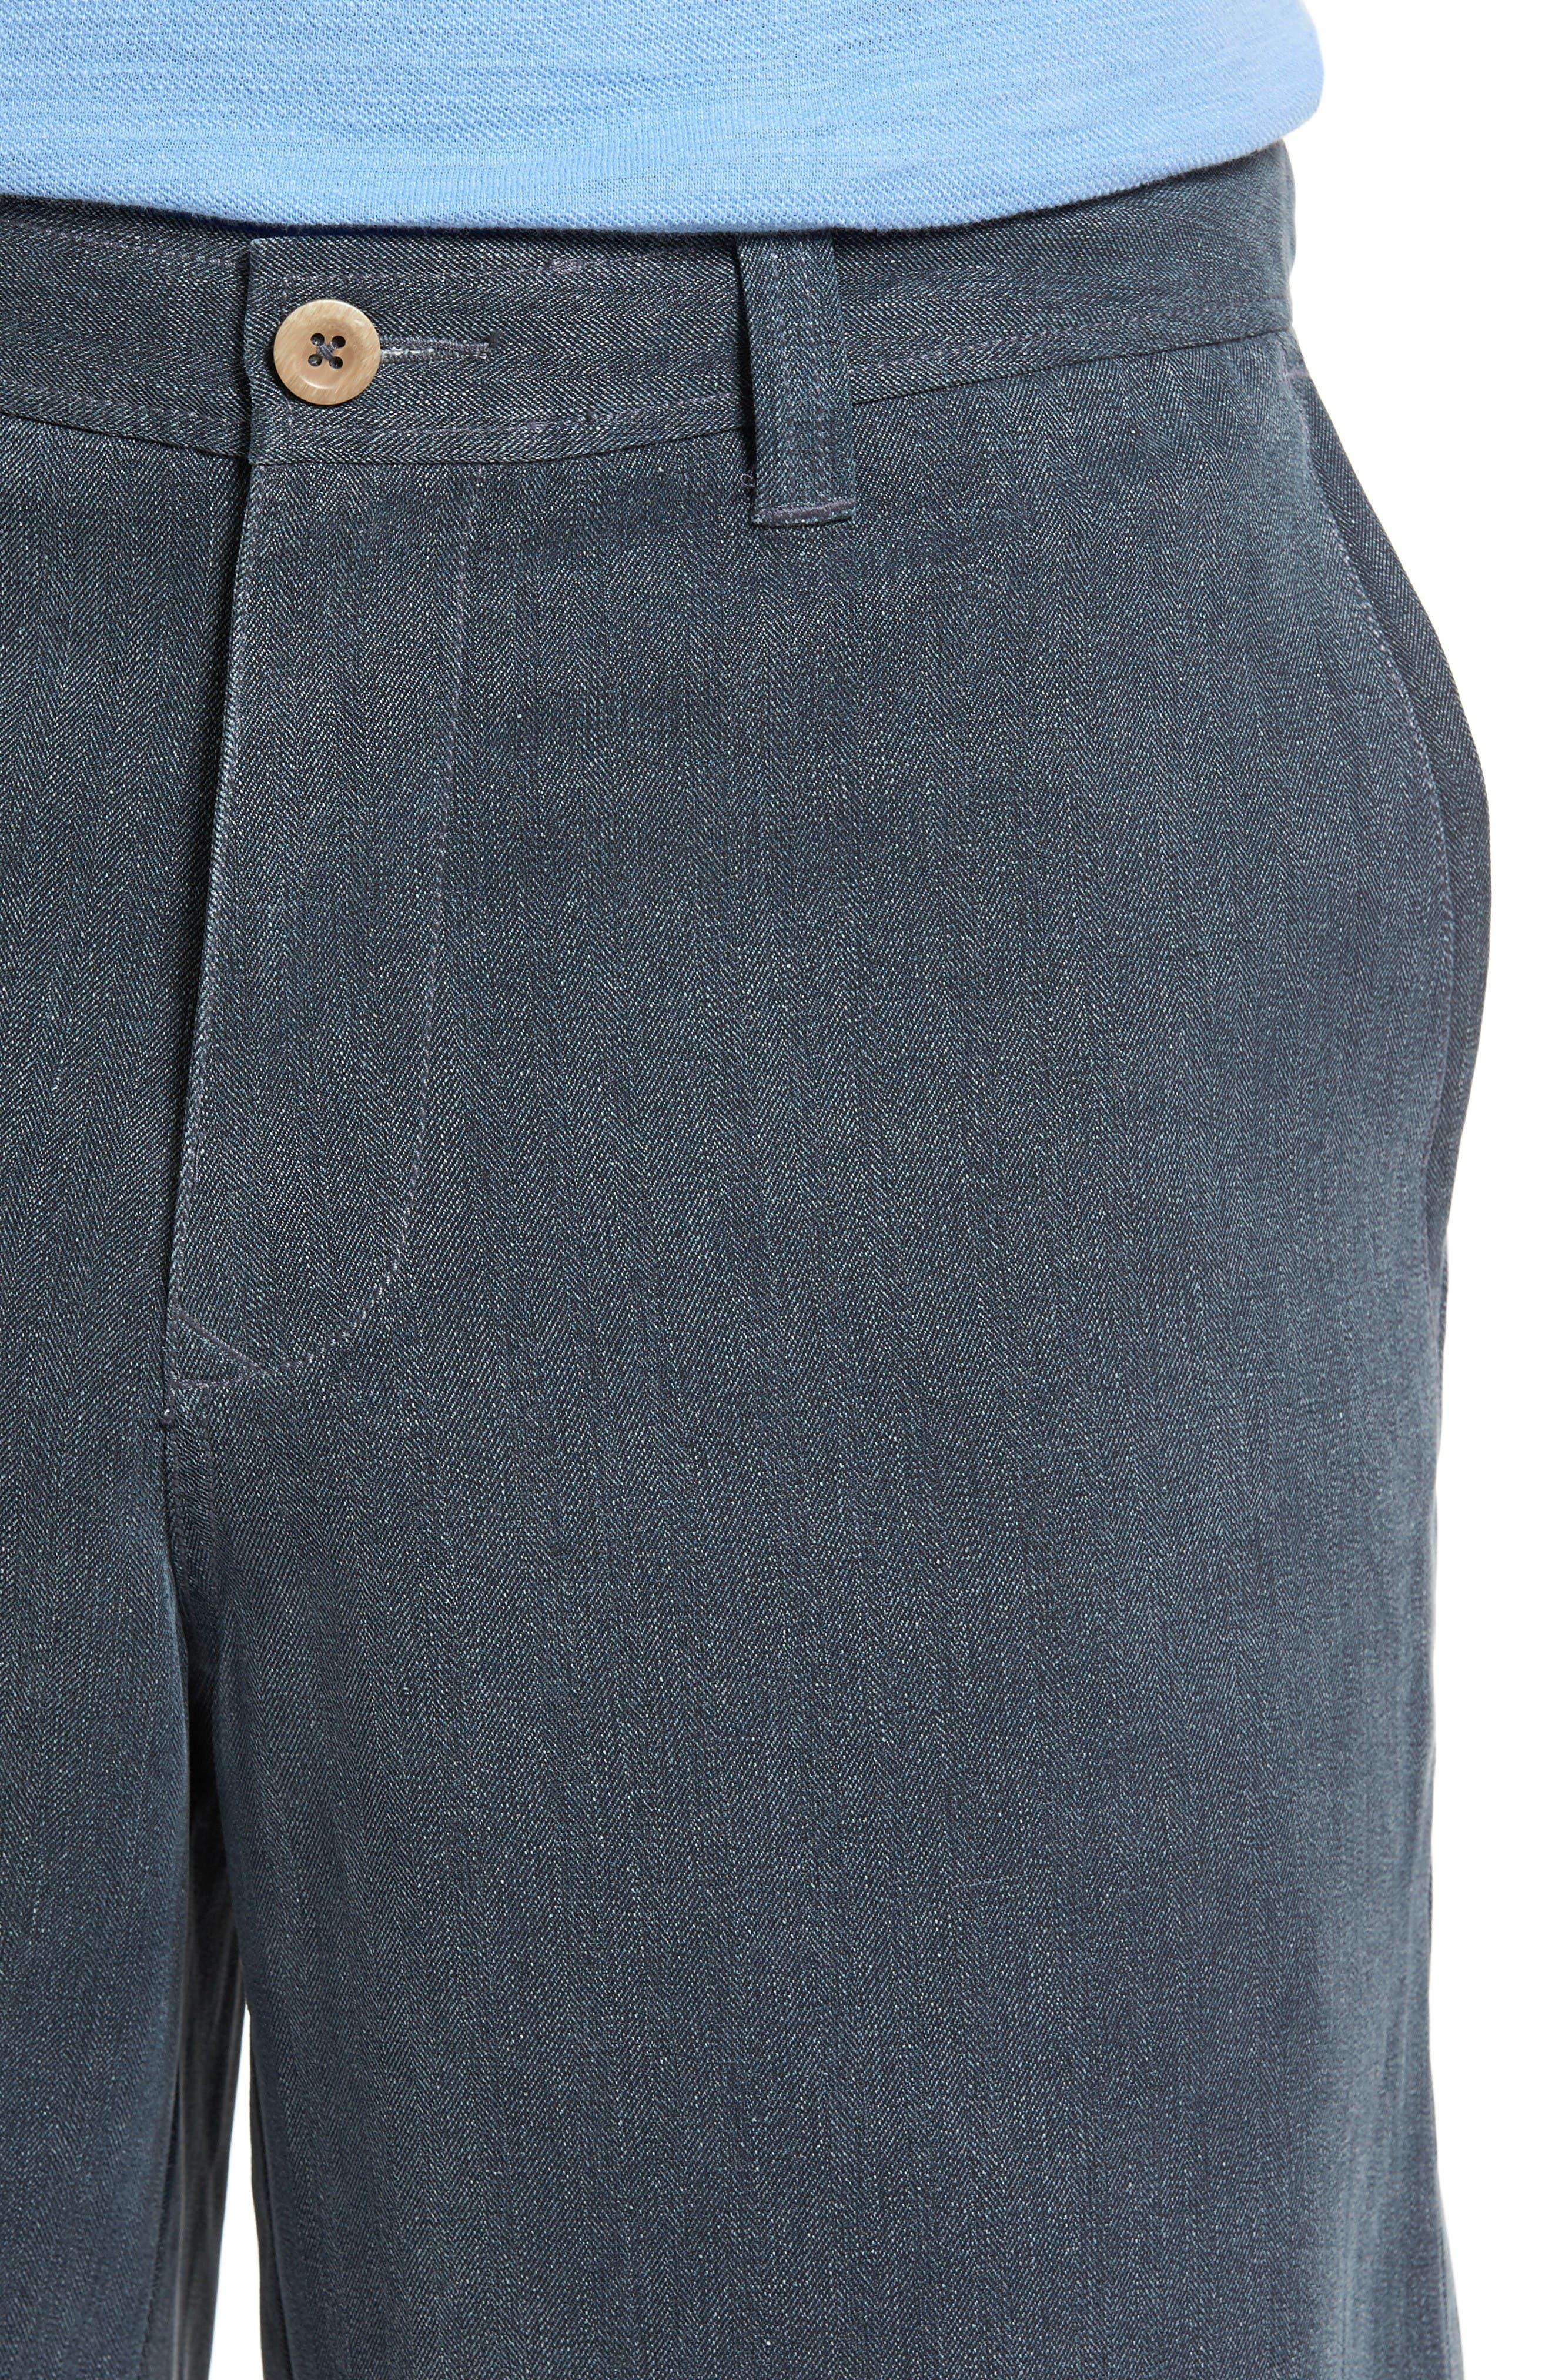 Alternate Image 4  - Tommy Bahama Havana Herringbone Silk Blend Chino Shorts